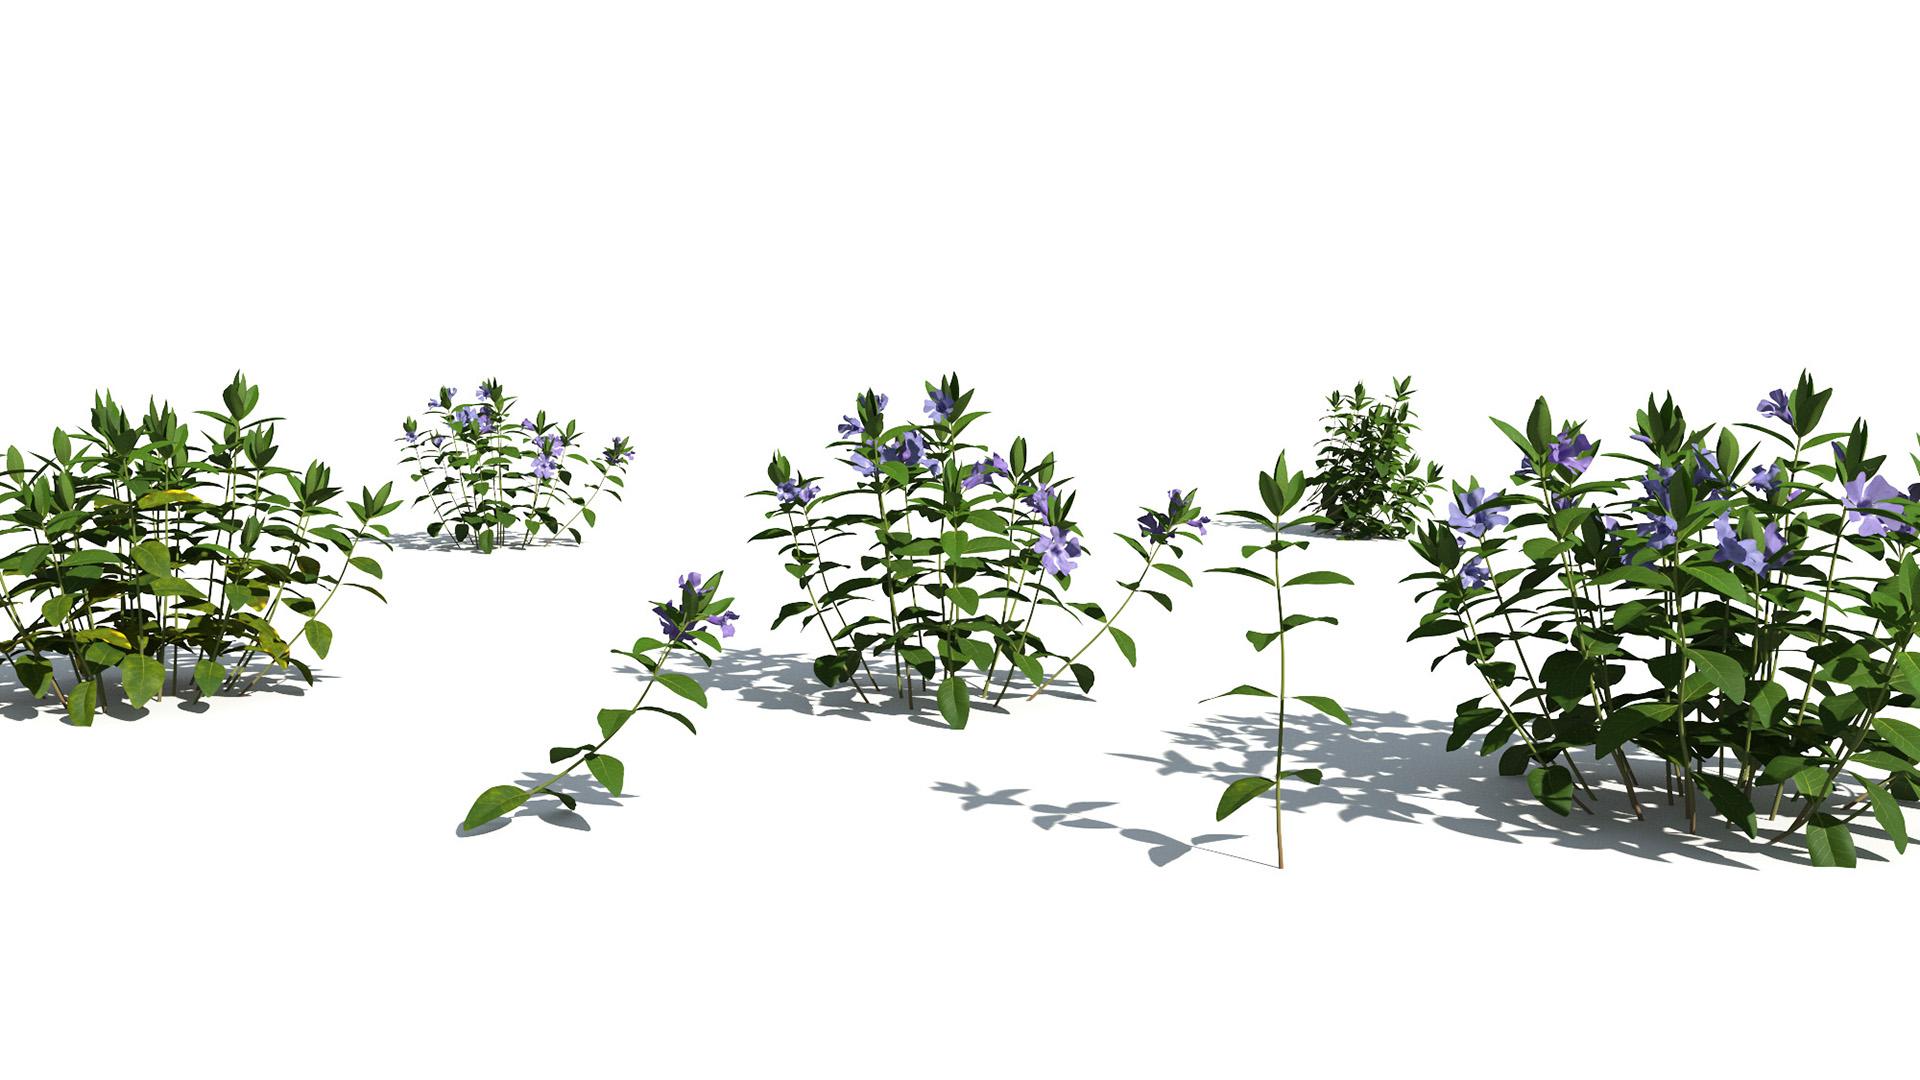 3D model of the Dwarf periwinkle Vinca minor different presets